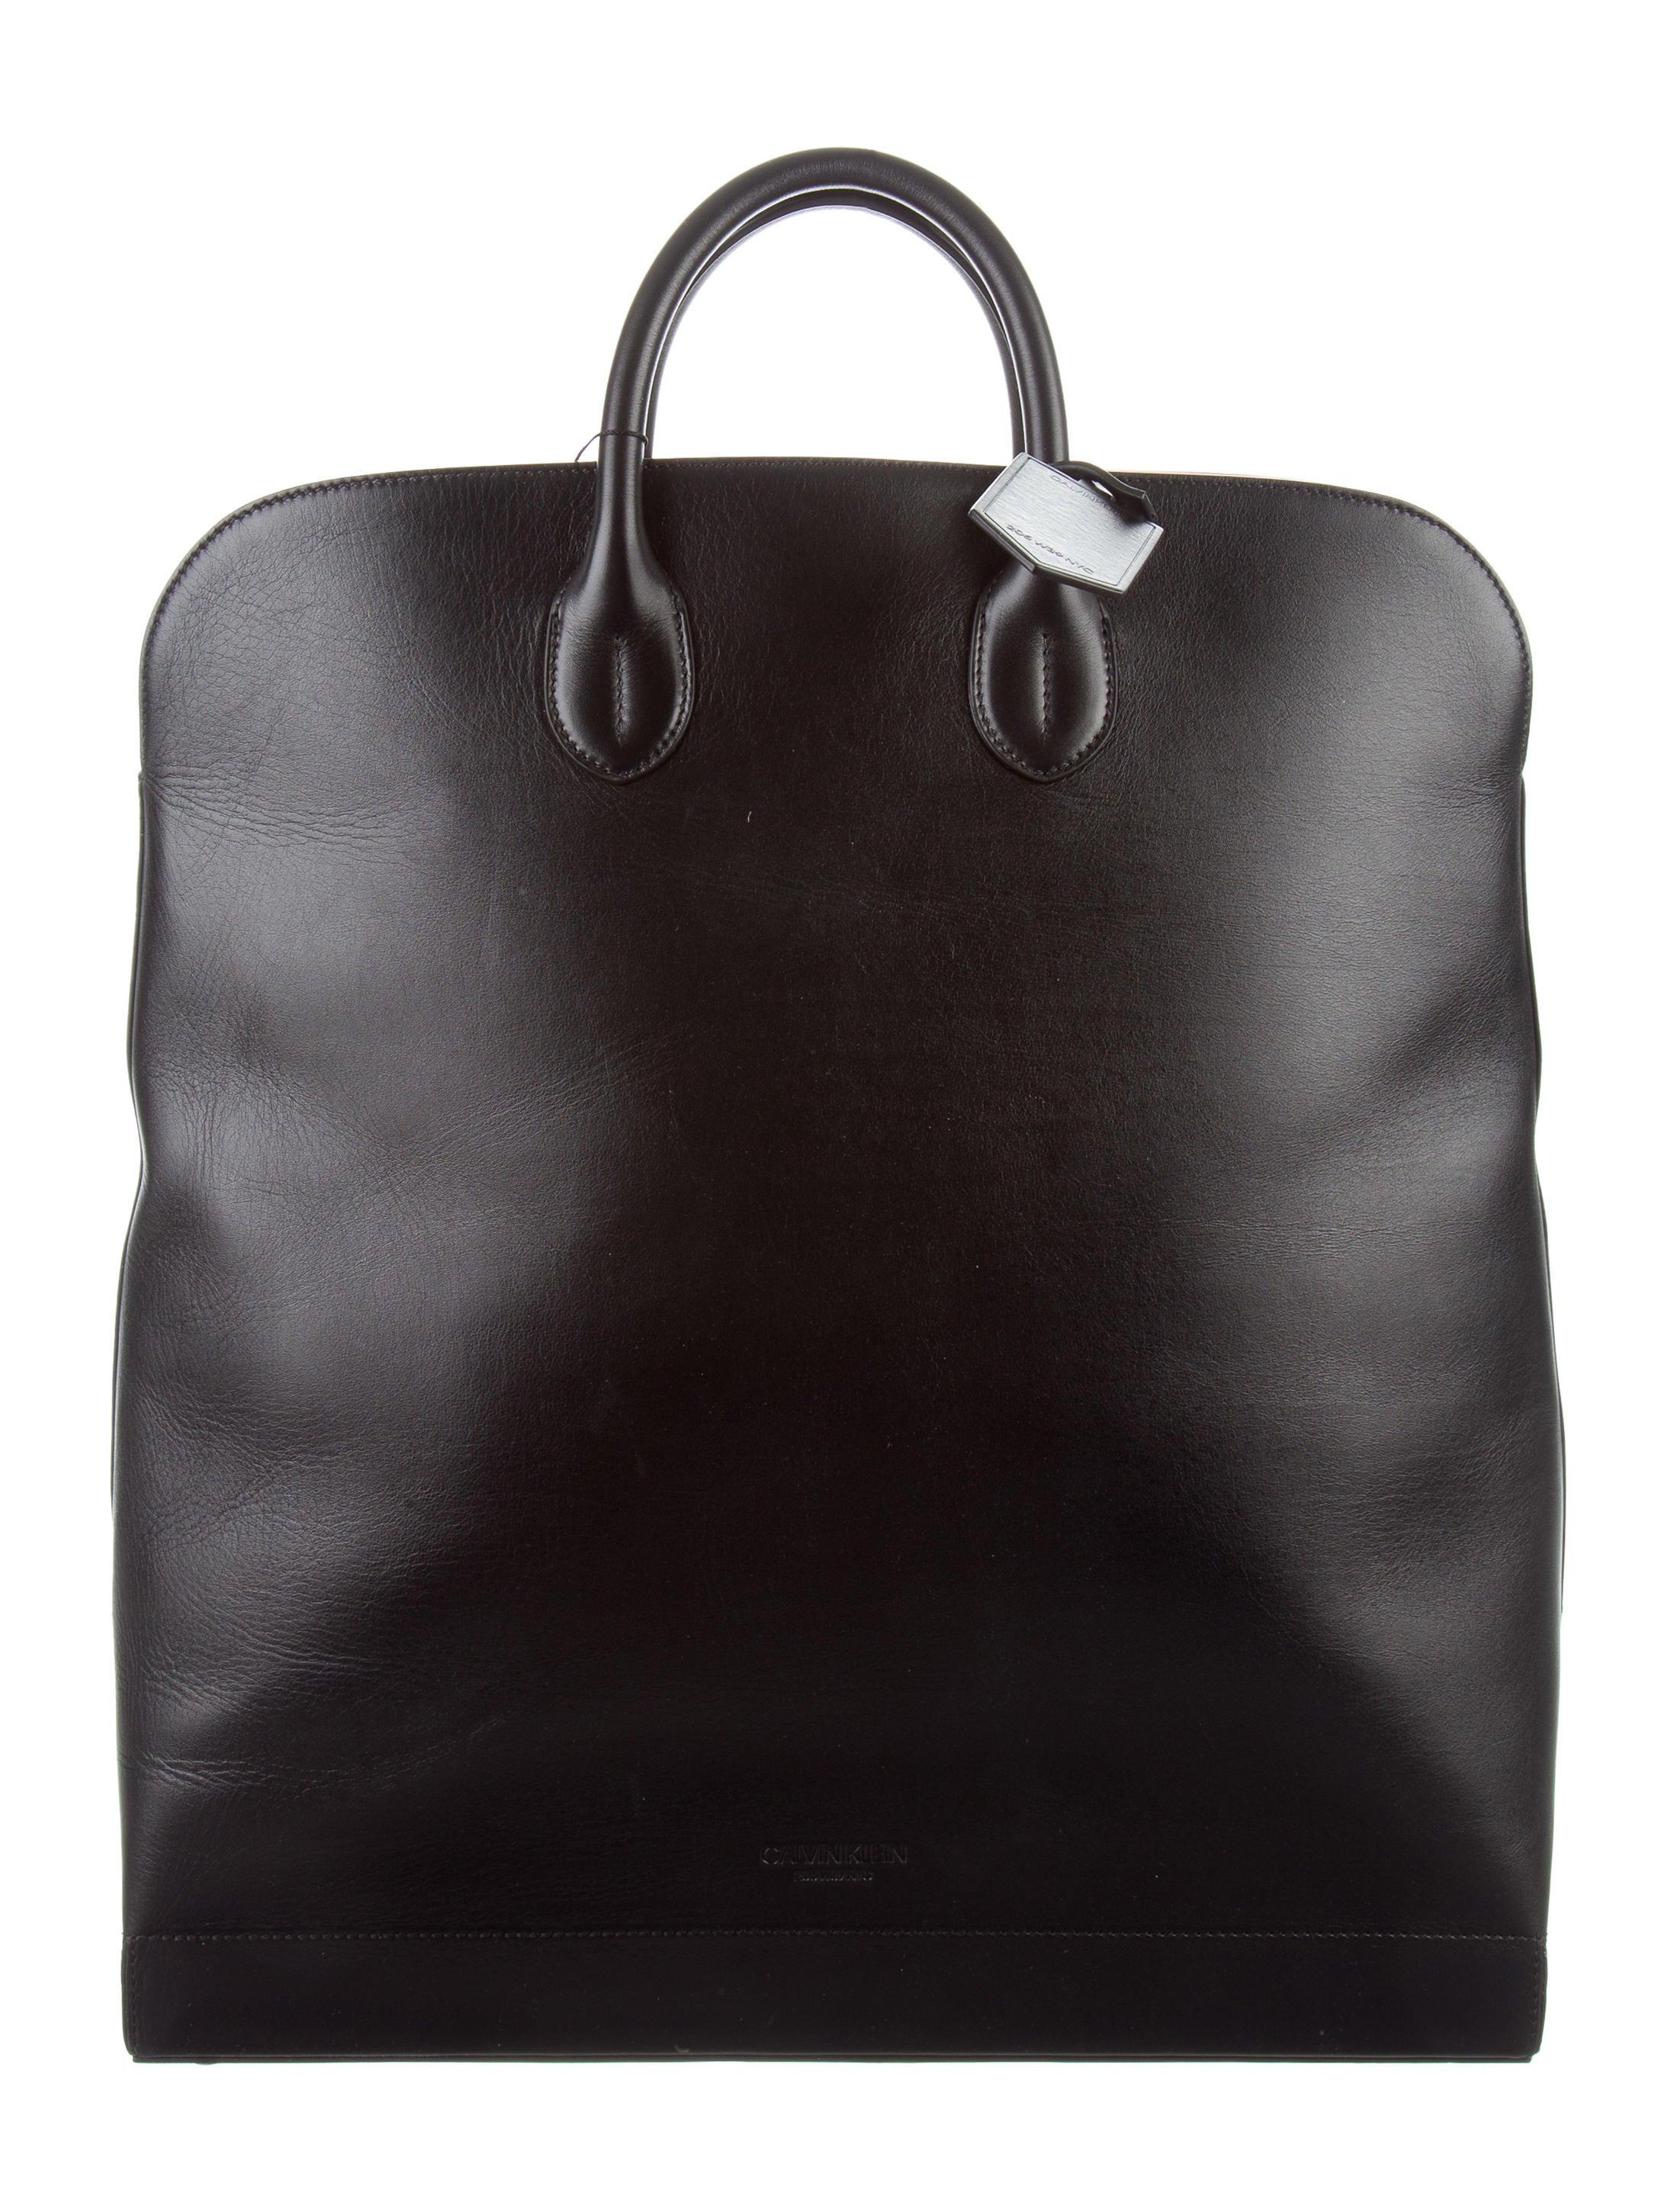 calvin klein large shopper tote handbags wyl20546. Black Bedroom Furniture Sets. Home Design Ideas